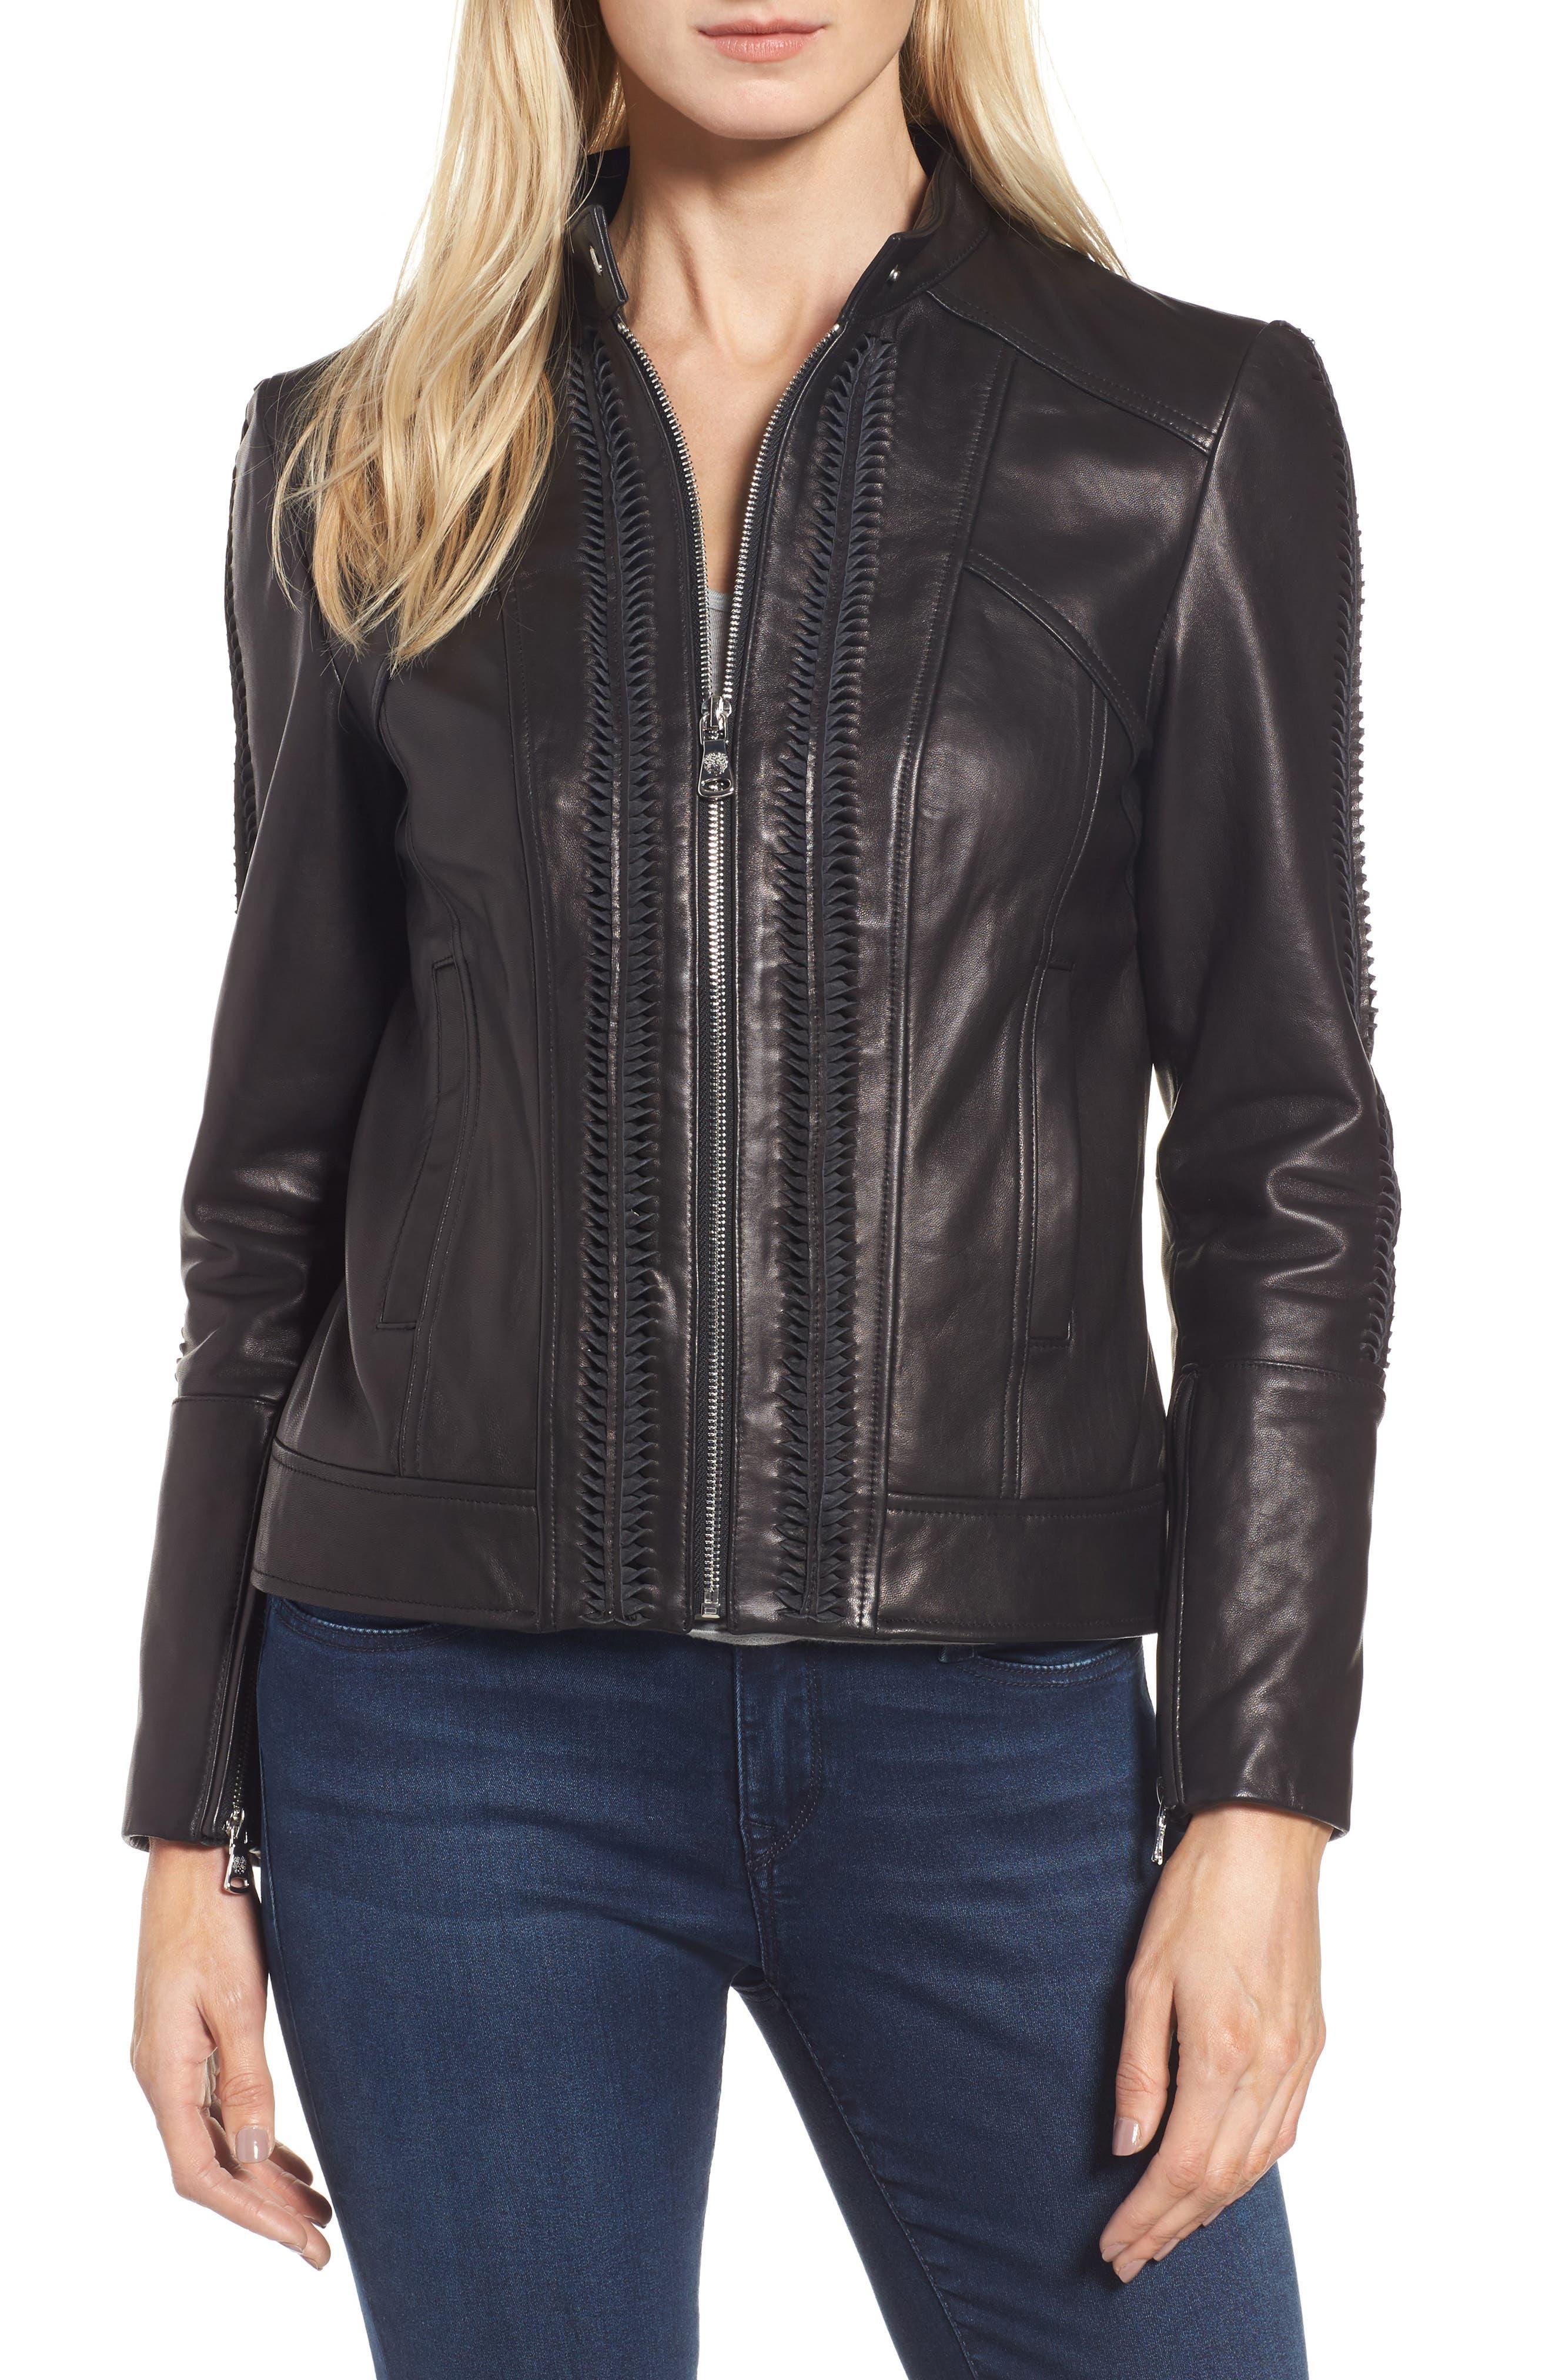 Braid Detail Leather Jacket,                             Main thumbnail 1, color,                             Black